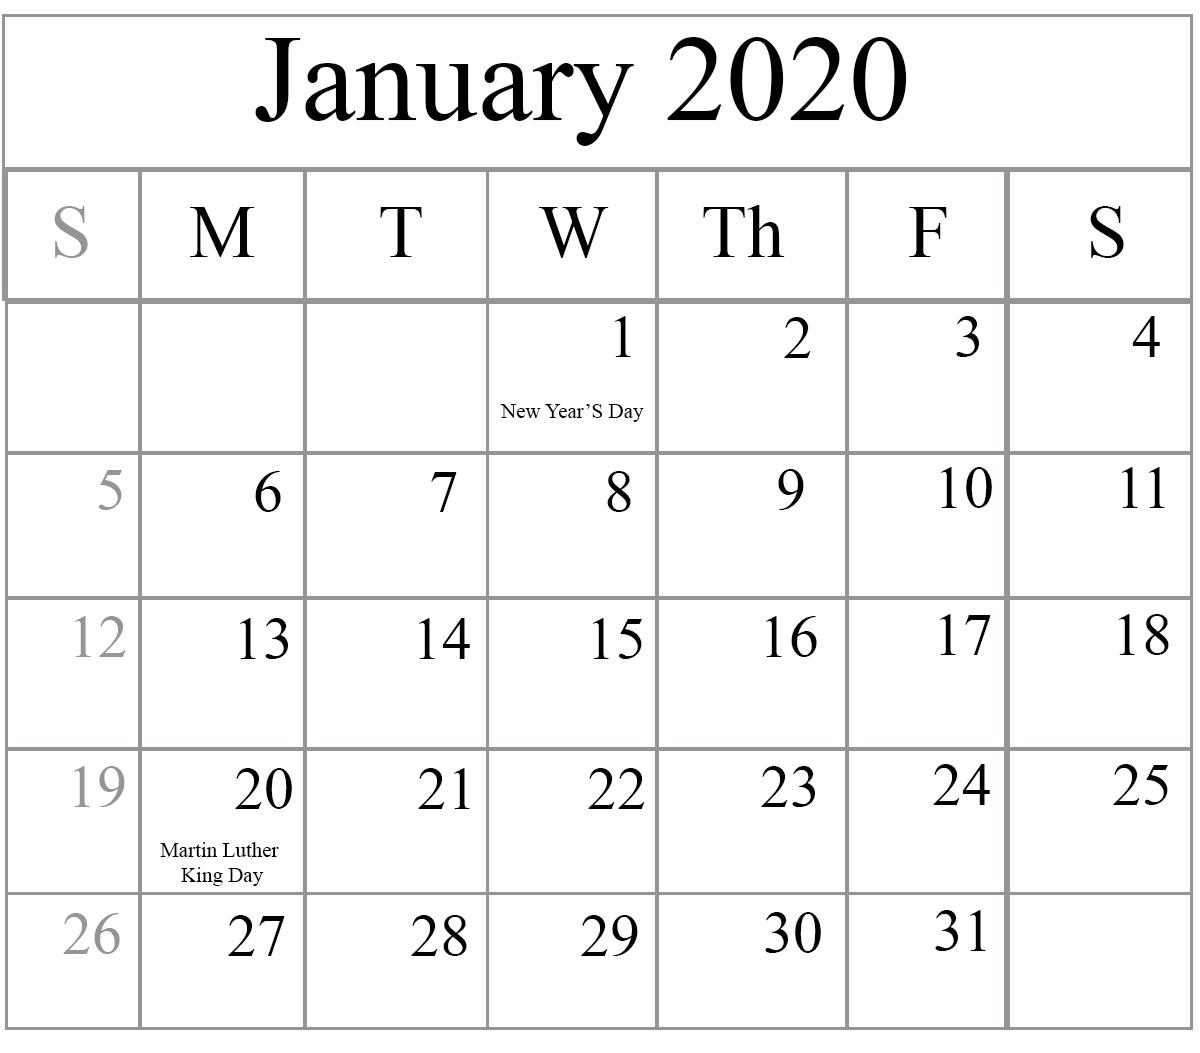 January 2020 Calendar Excel | Free Printable Calendar